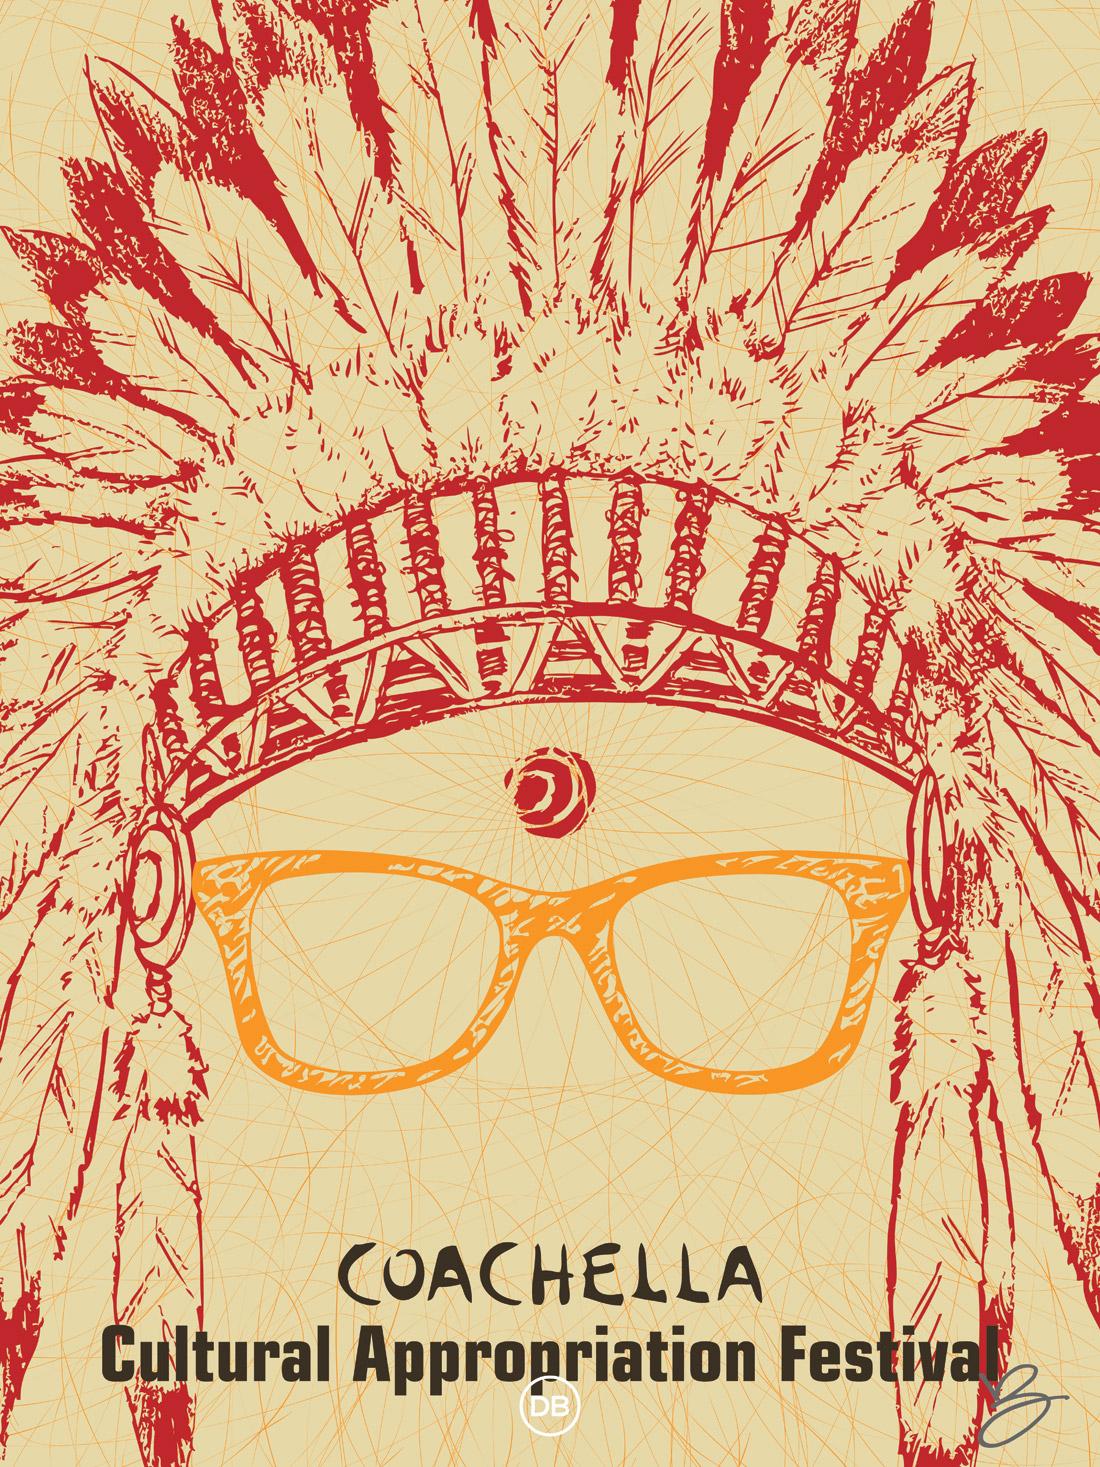 Indian Country 52 #15 - Bindi (Coachella) | David Bernie